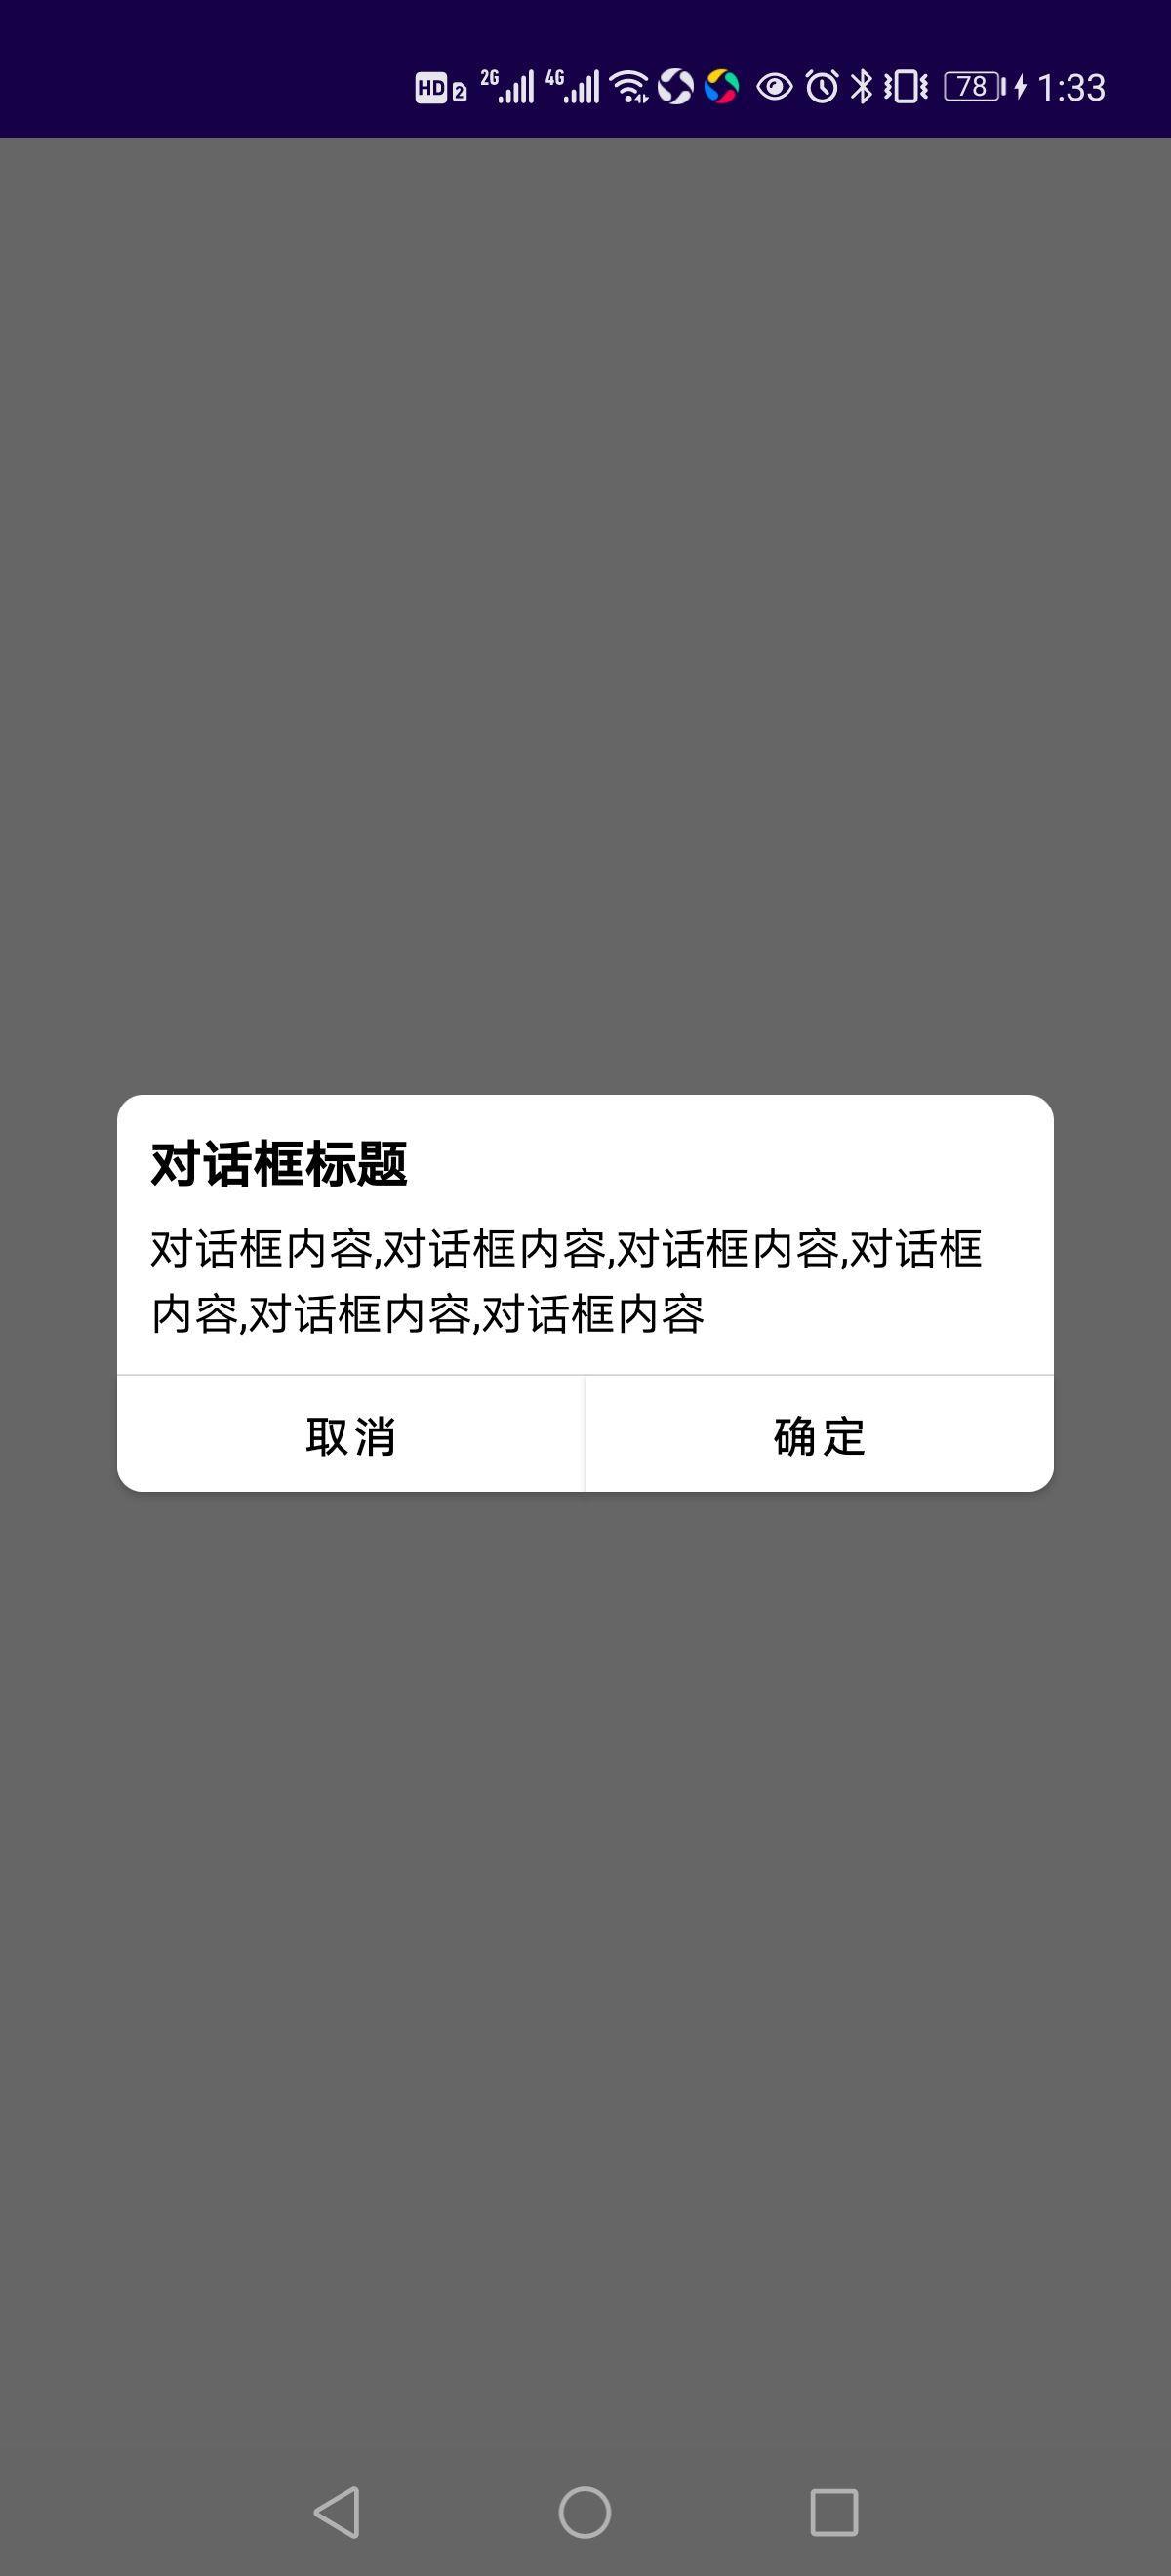 Screenshot_20210512_133307_dialog.jpg